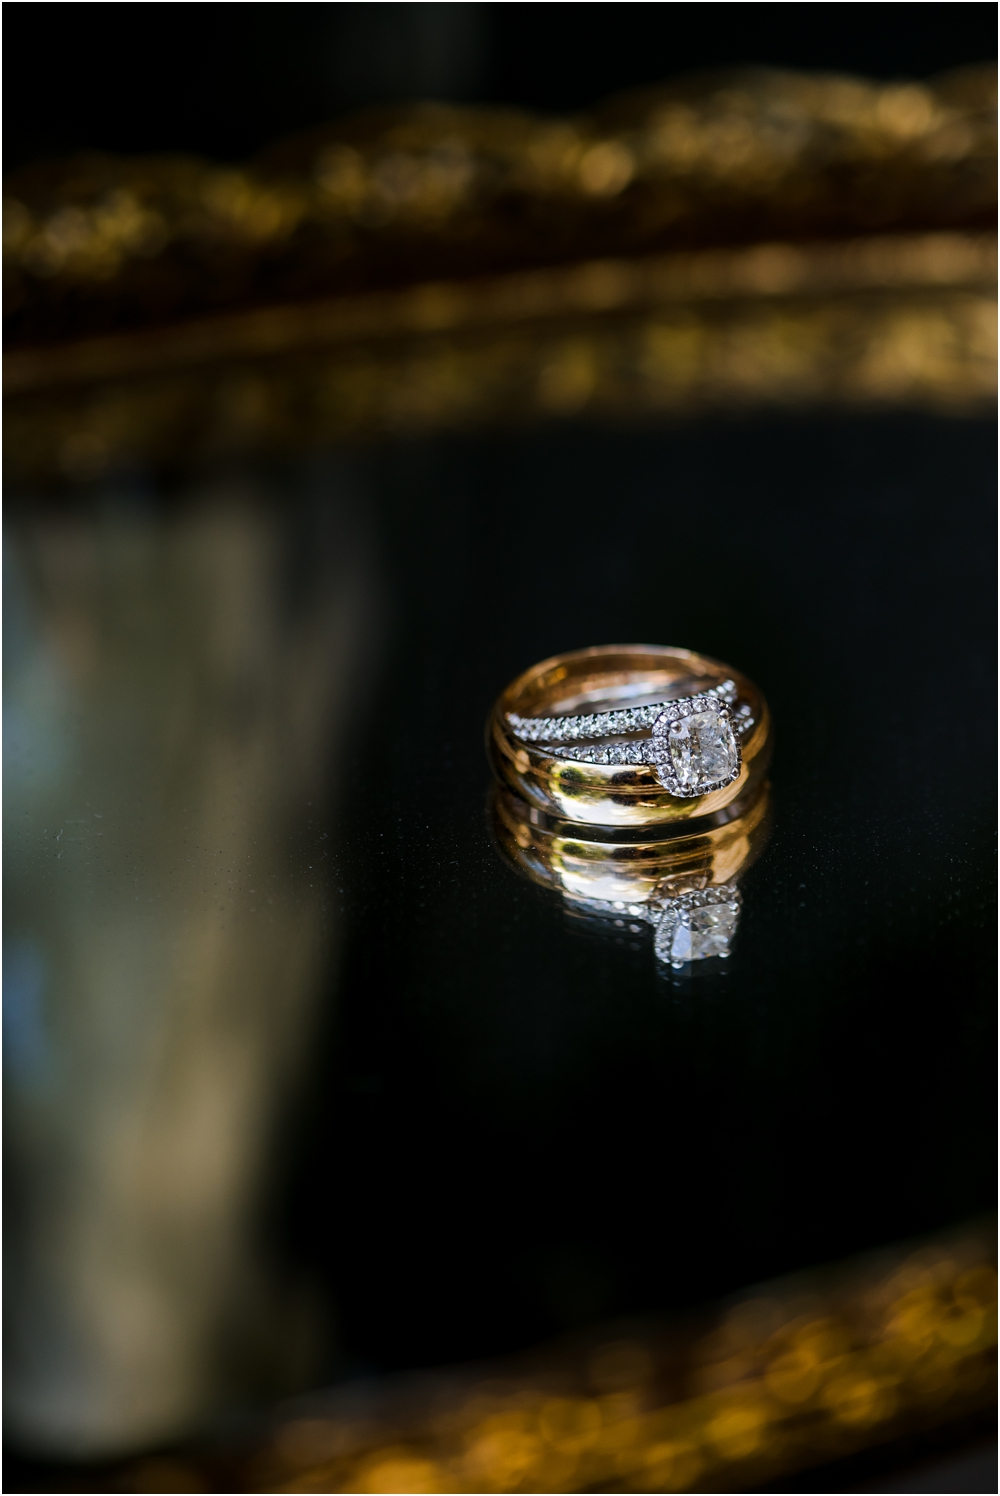 matthew-wedding-kiersten-stevenson-photography-30a-panama-city-beach-dothan-tallahassee-(23-of-579).JPG